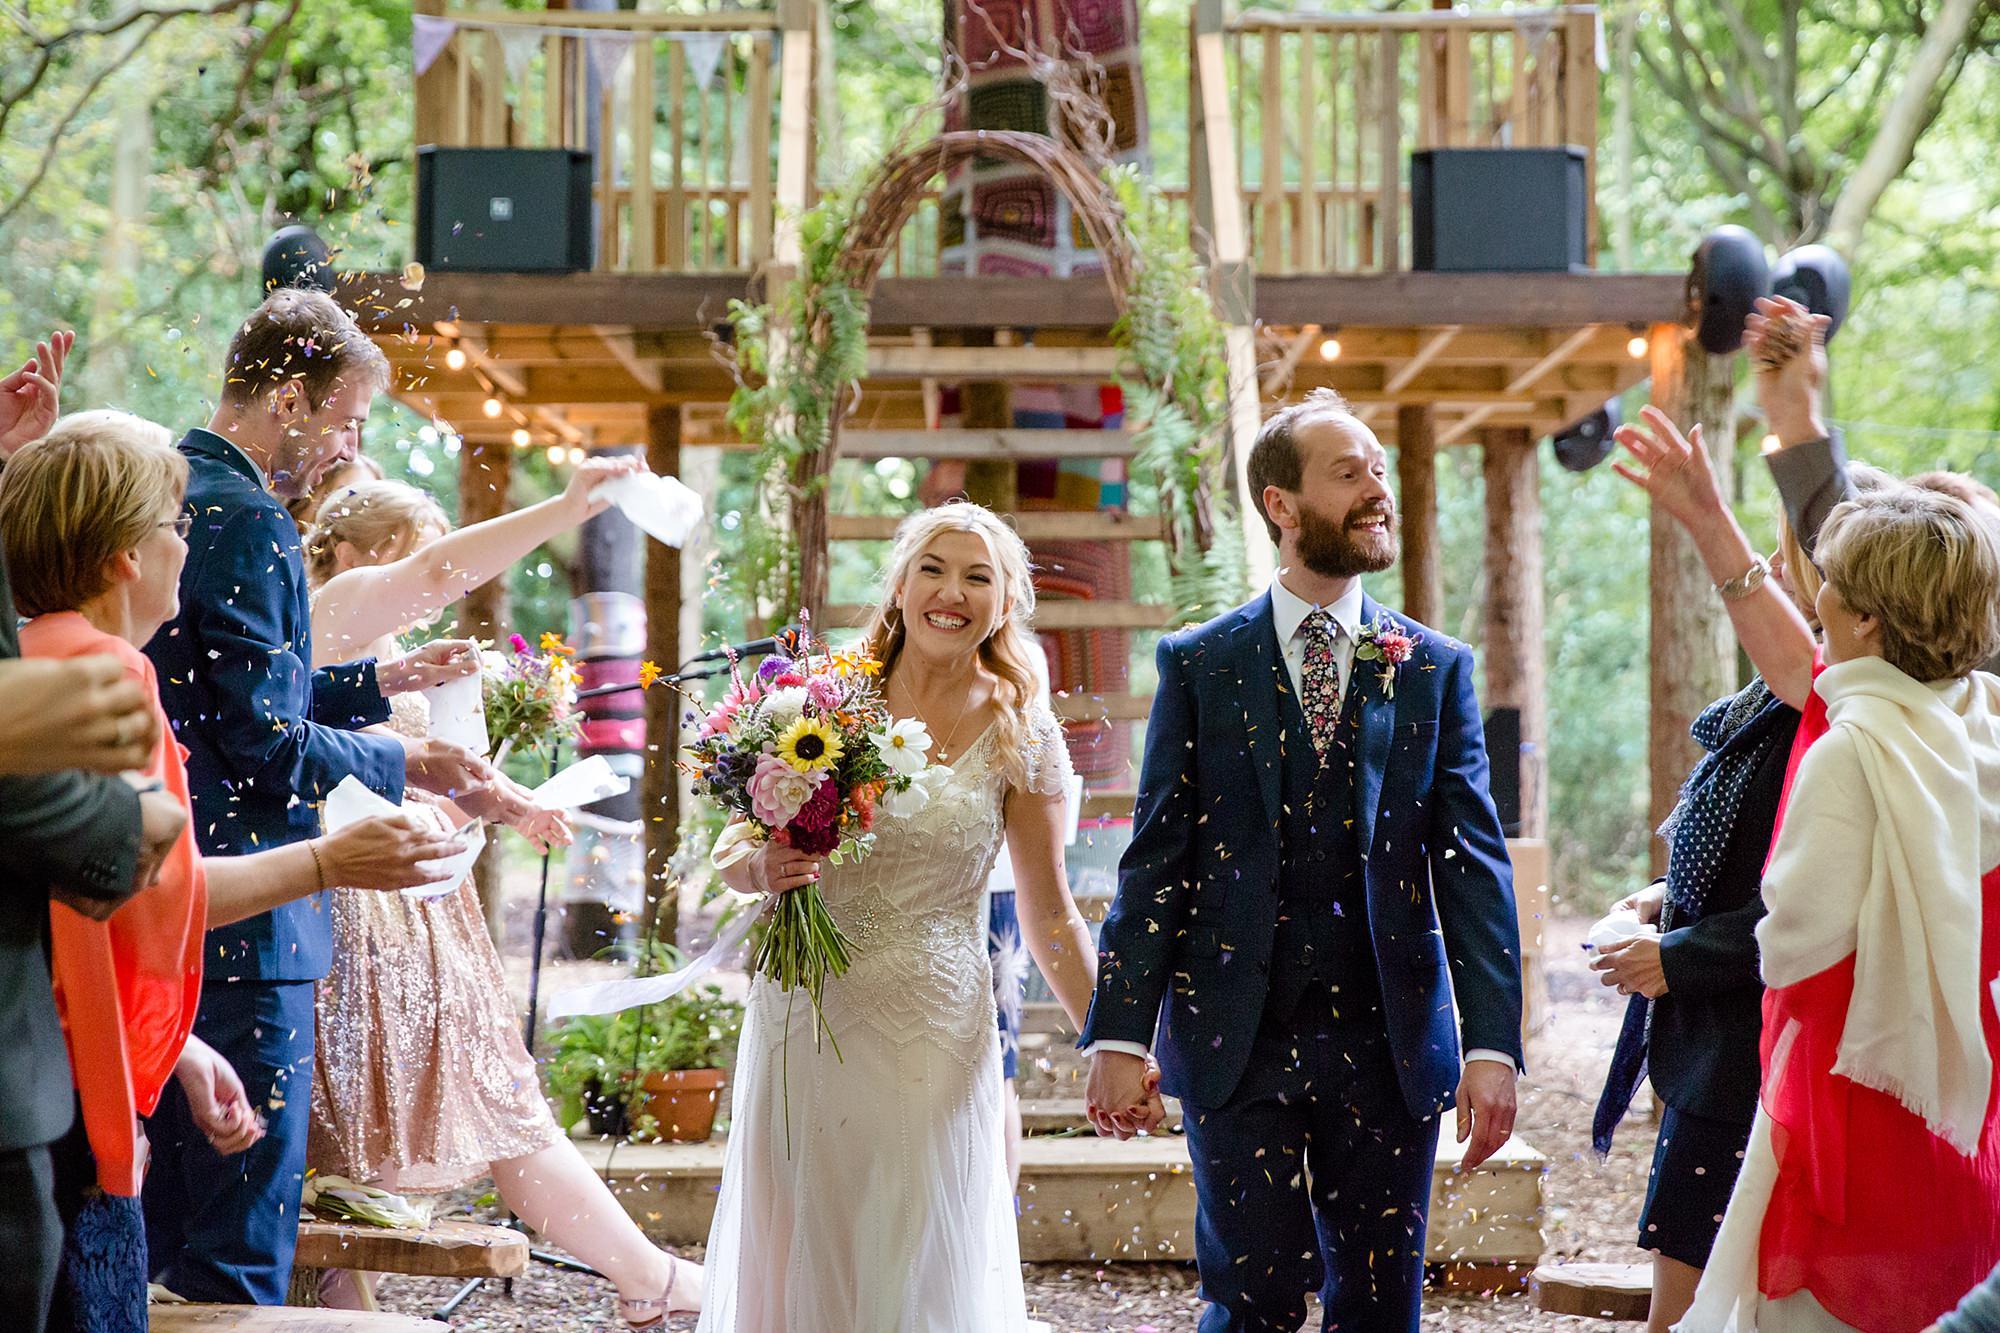 Woodland Weddings Tring bride and groom in confetti